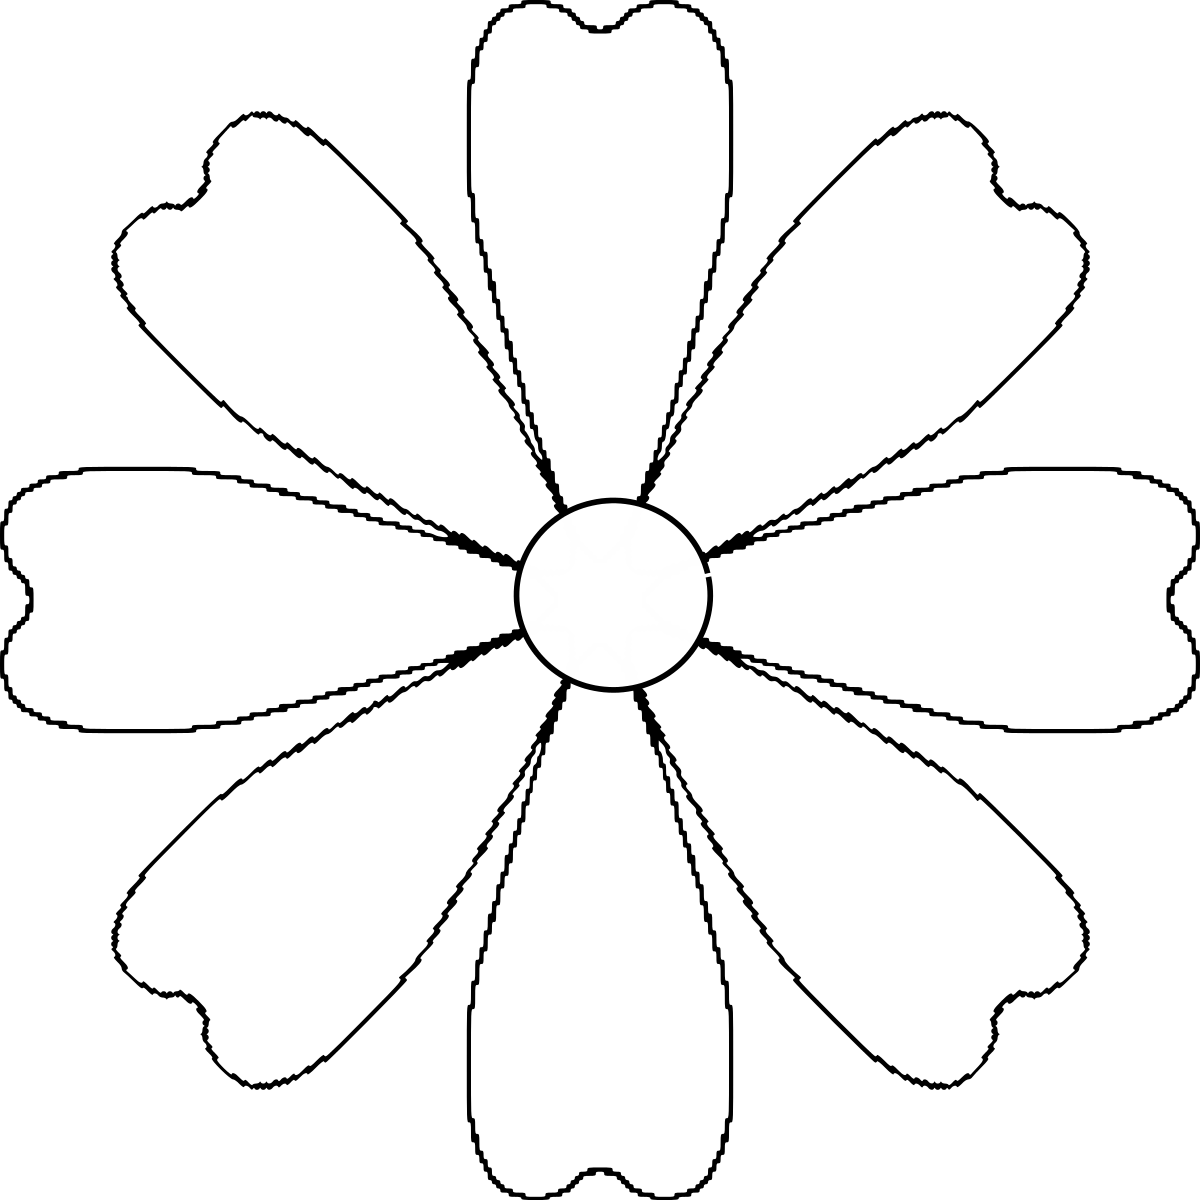 Картинка раскраска ромашка